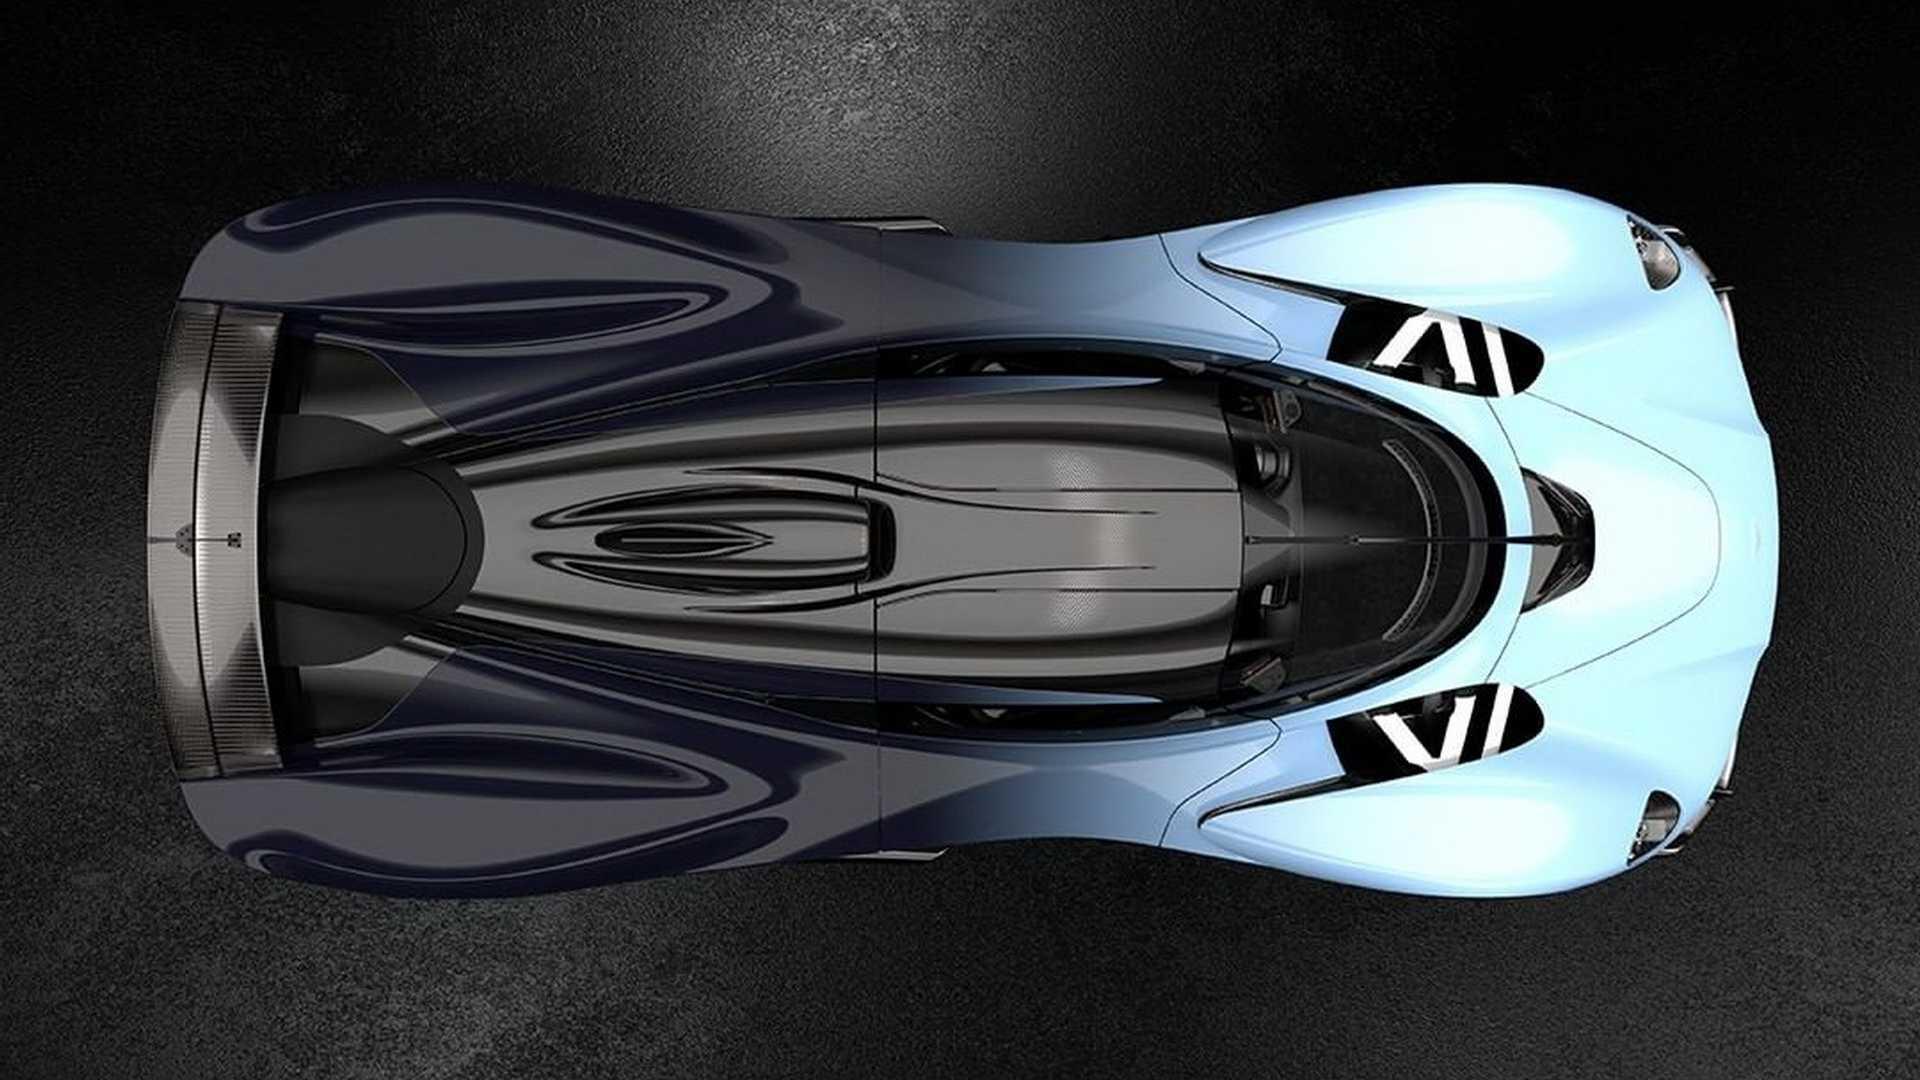 Aston Martin Valkyrie 1118 03